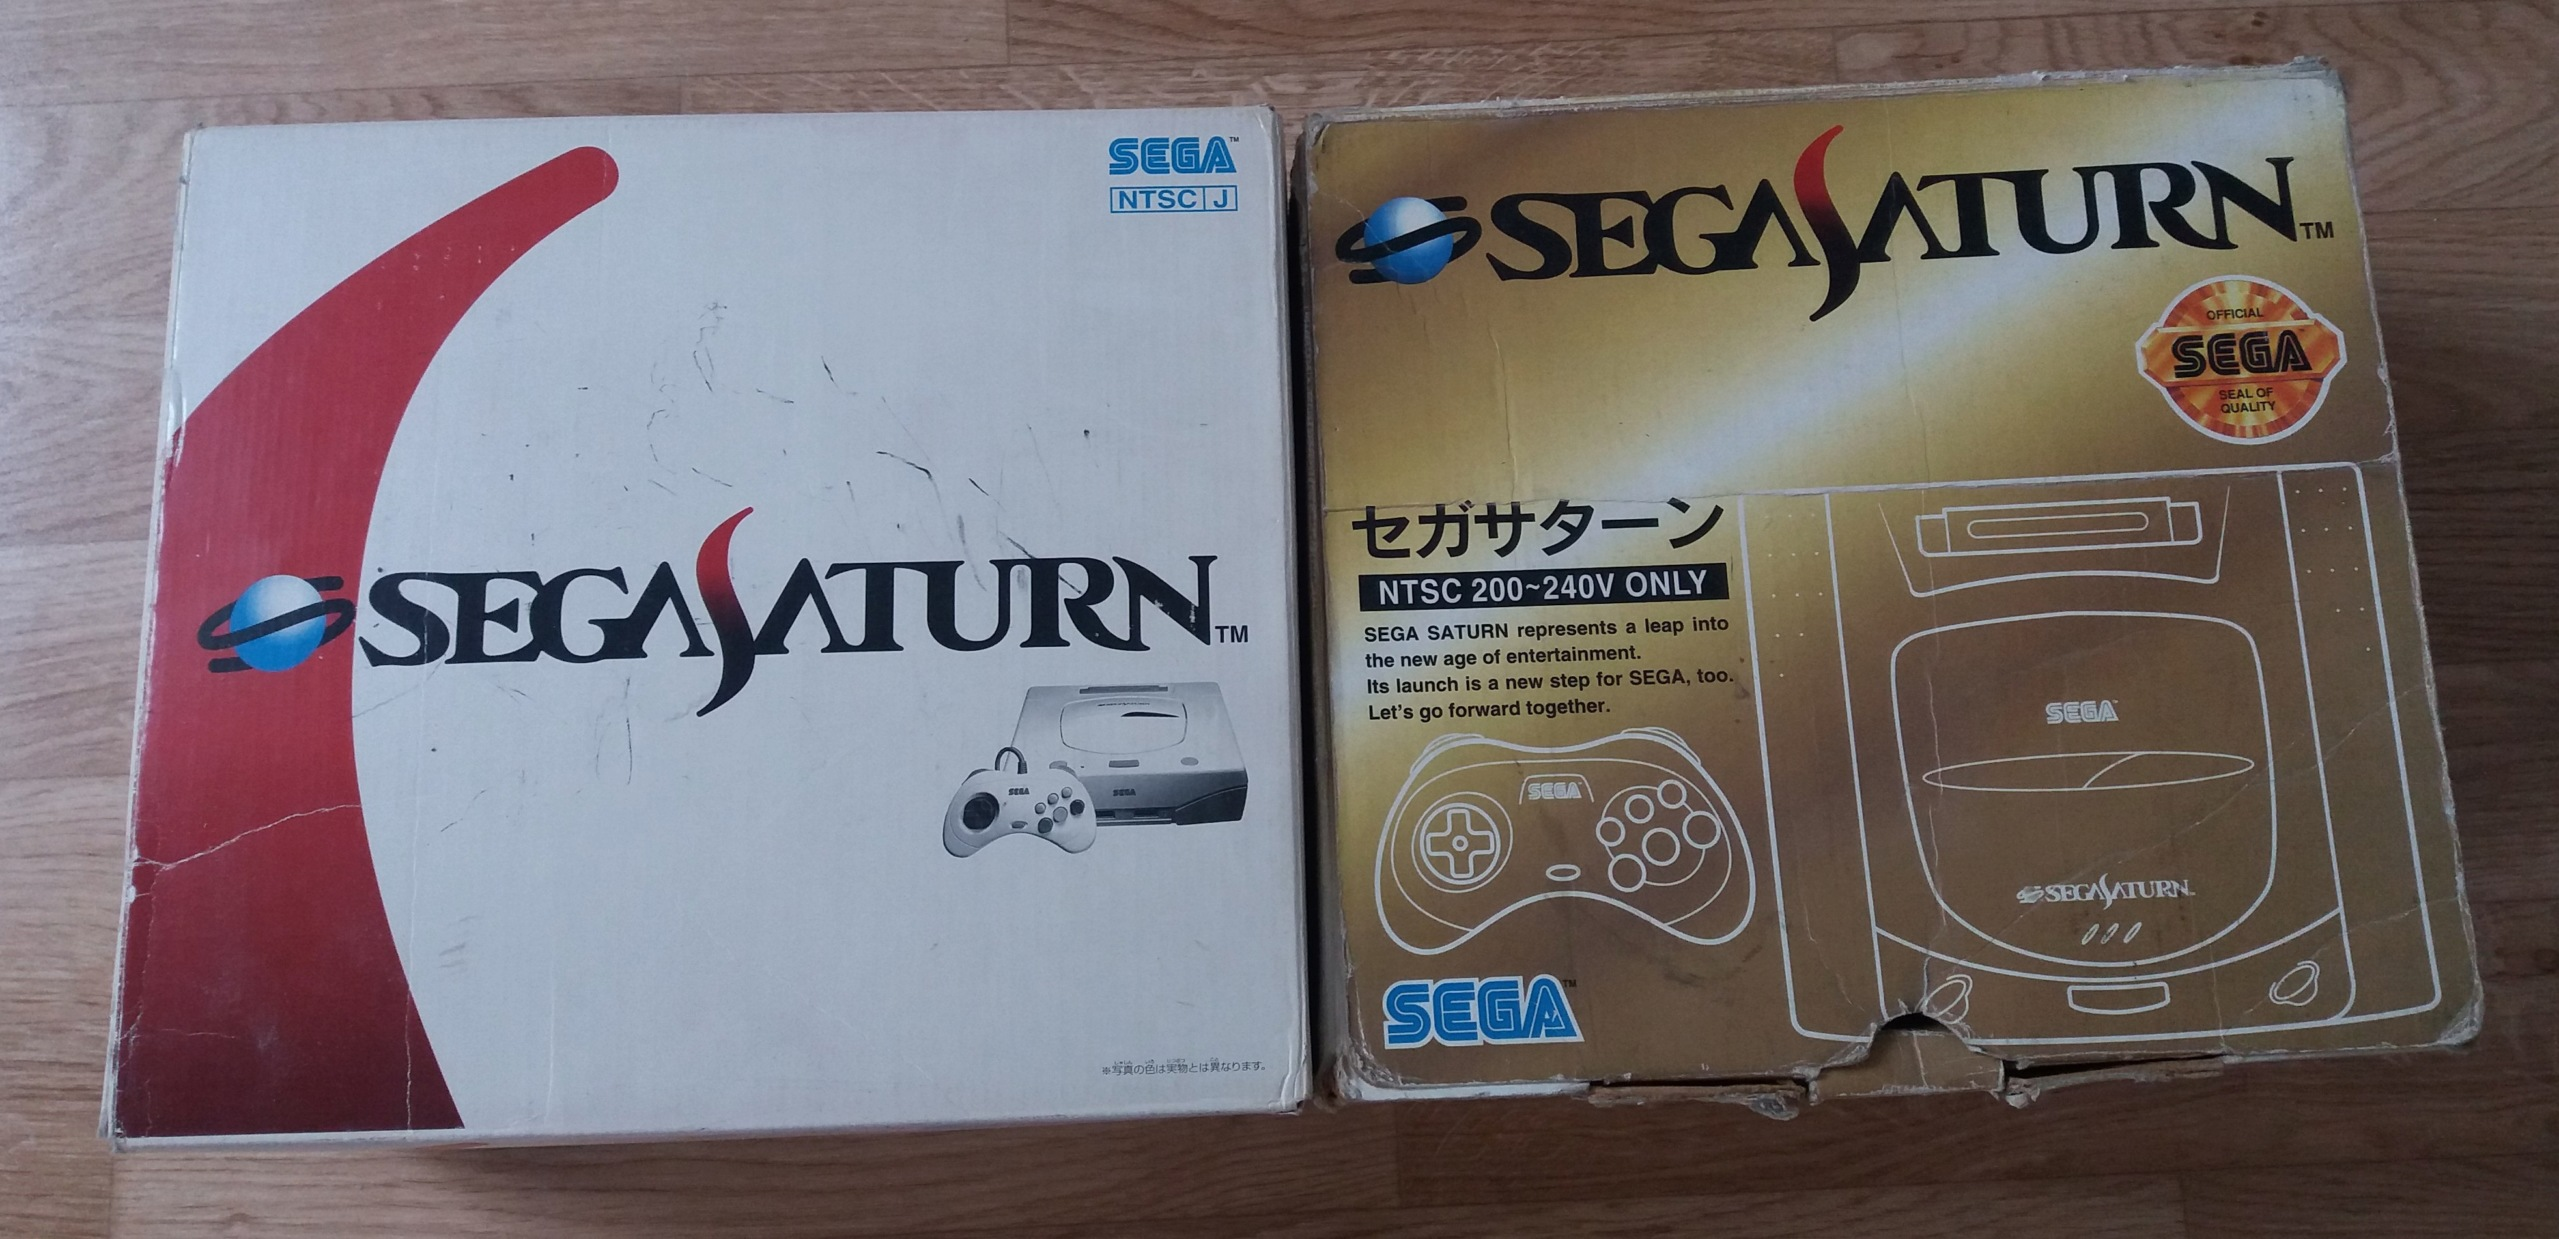 retroactionman Collection Segasa10